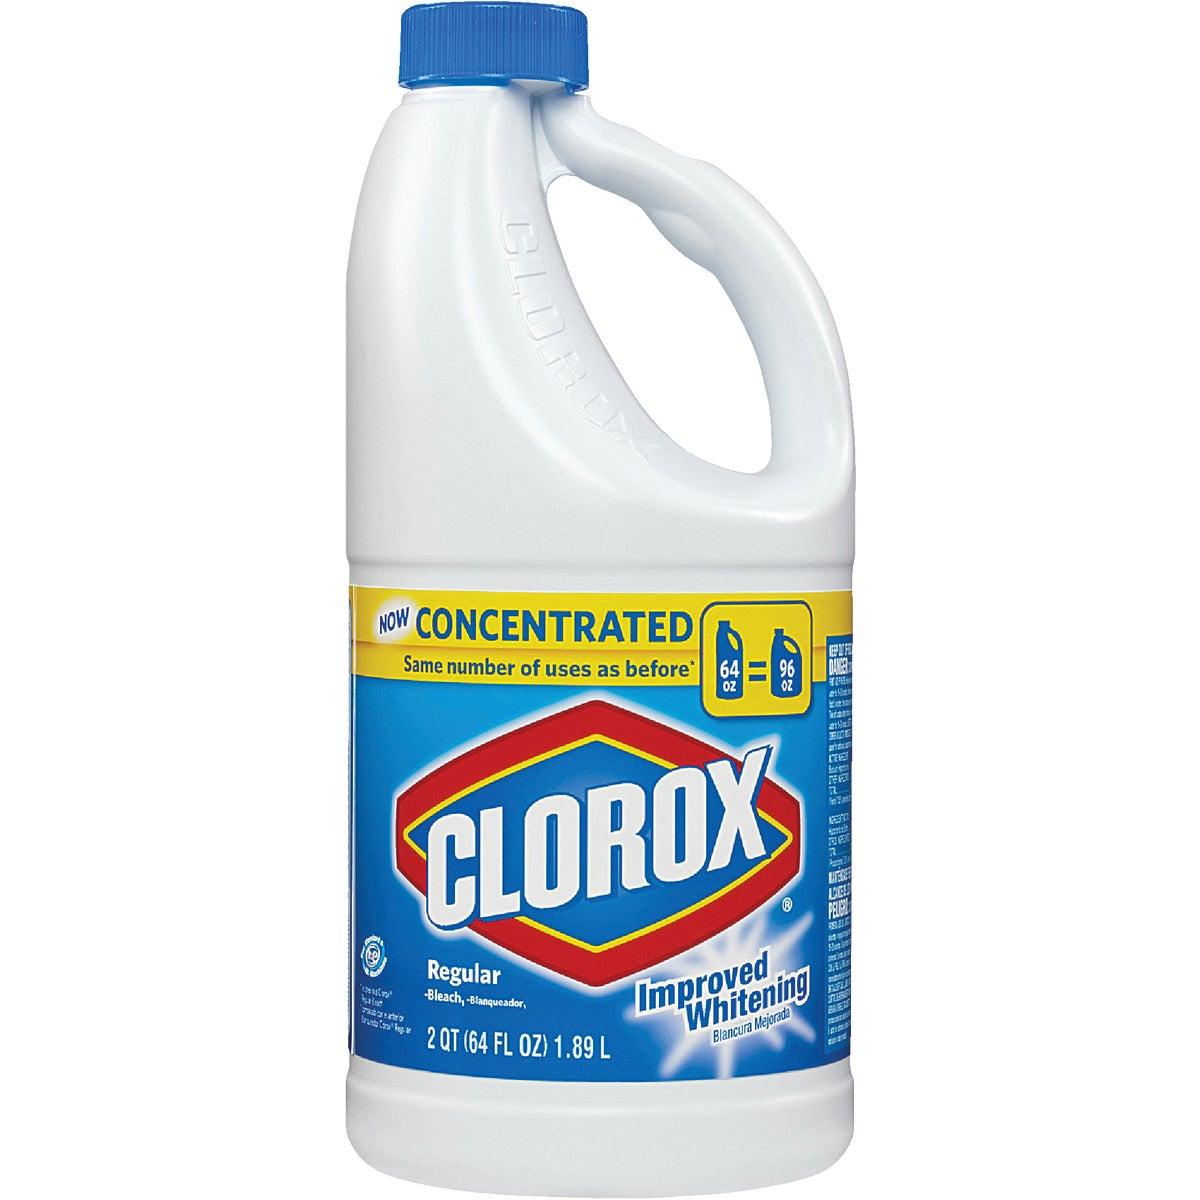 64OZ REG CNCNTRTD BLEACH - 30769 by Clorox/home Cleaning